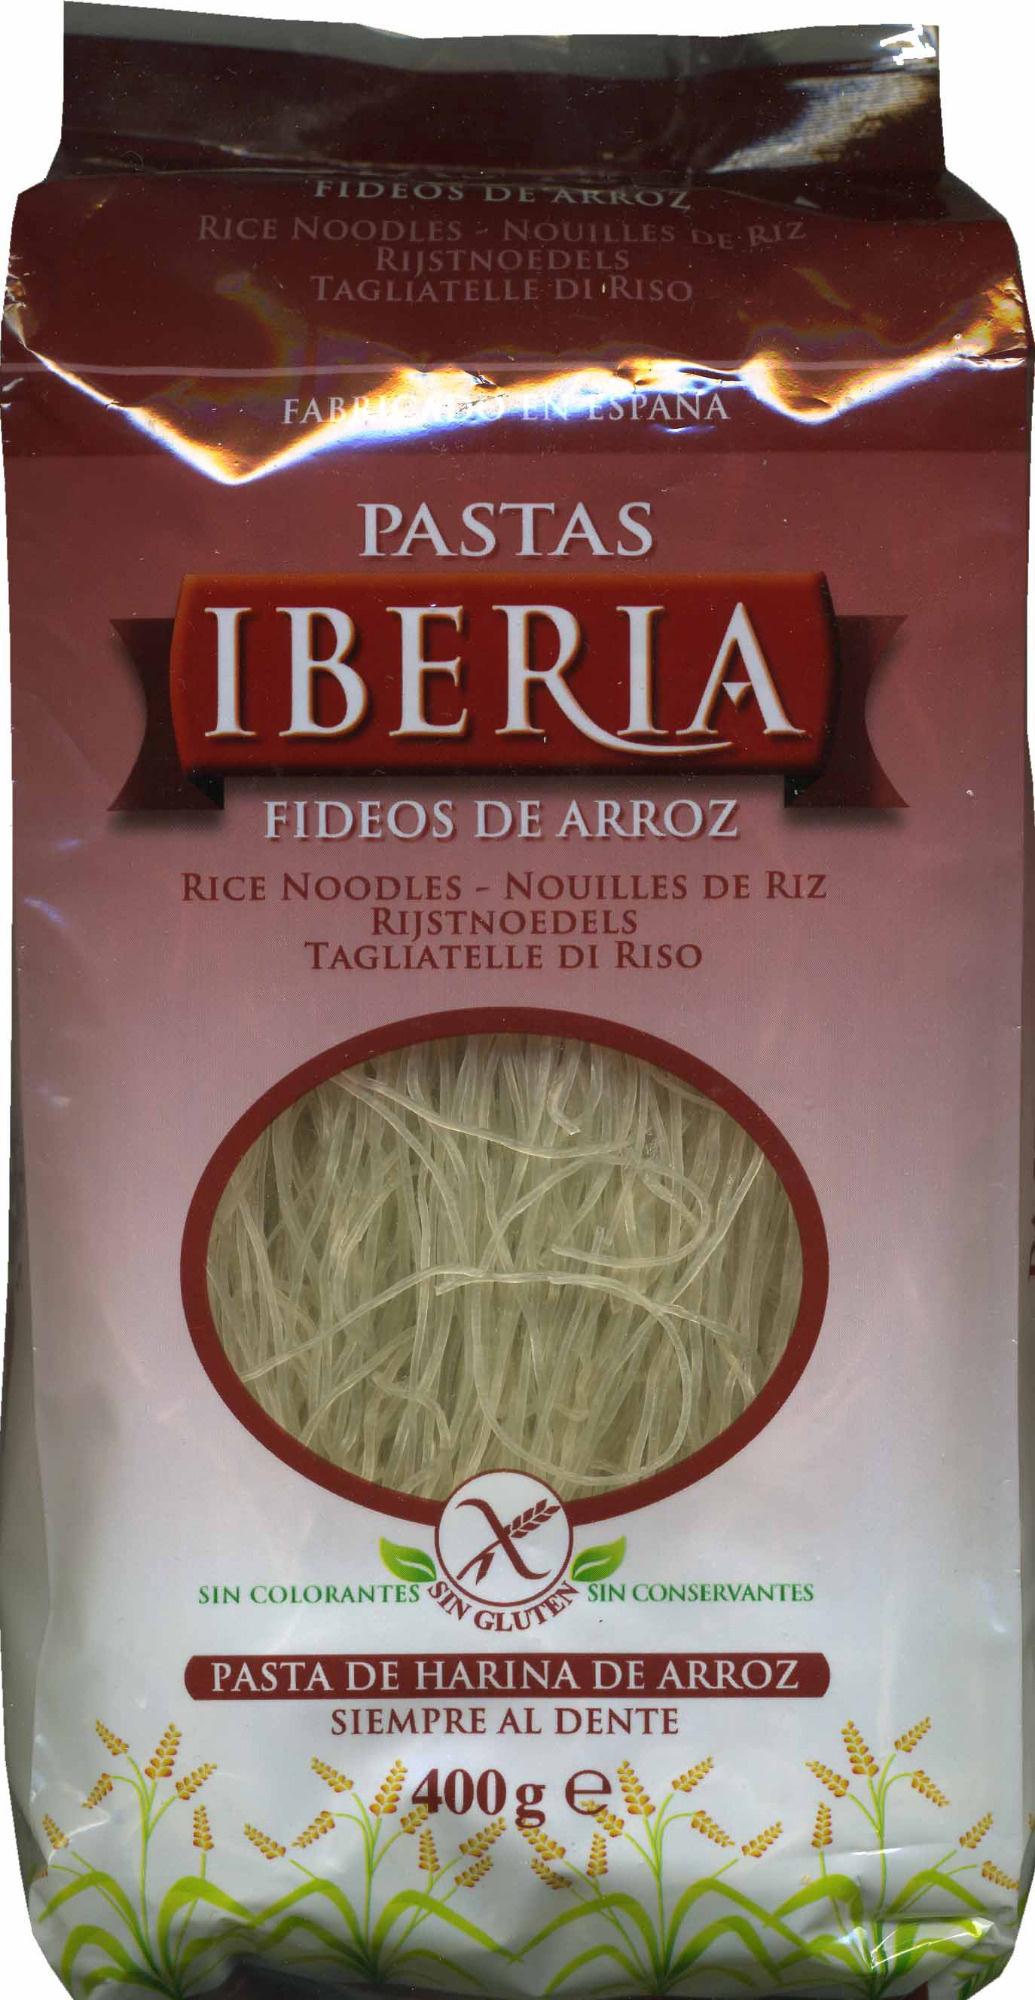 Fideos de arroz - Producto